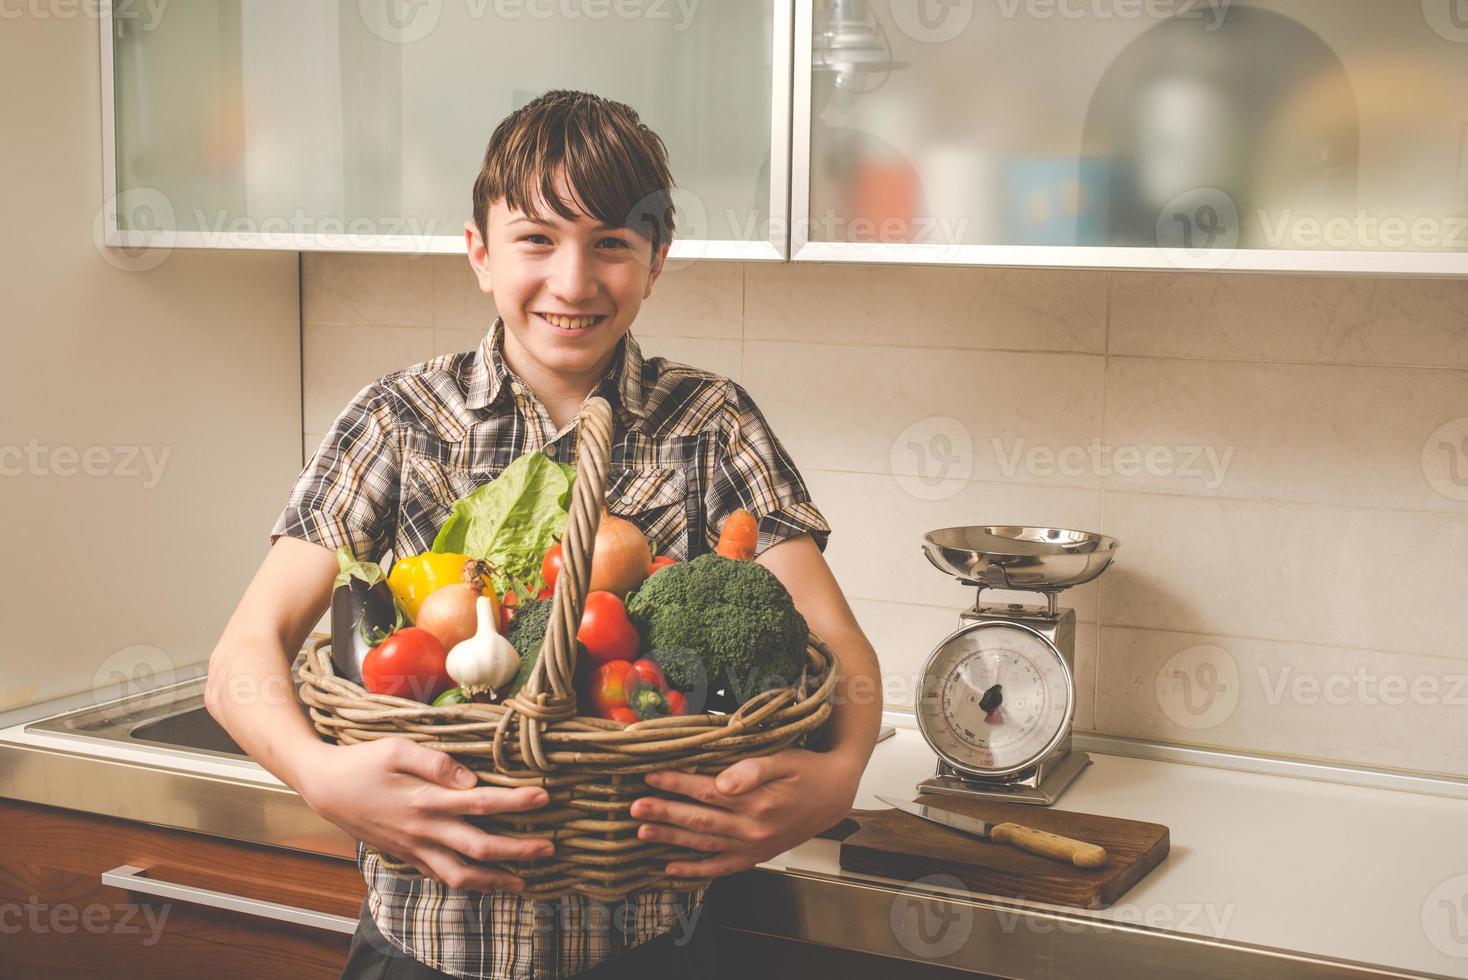 boy prepares vegetables in the kitchen - vegetarian healthy people photo